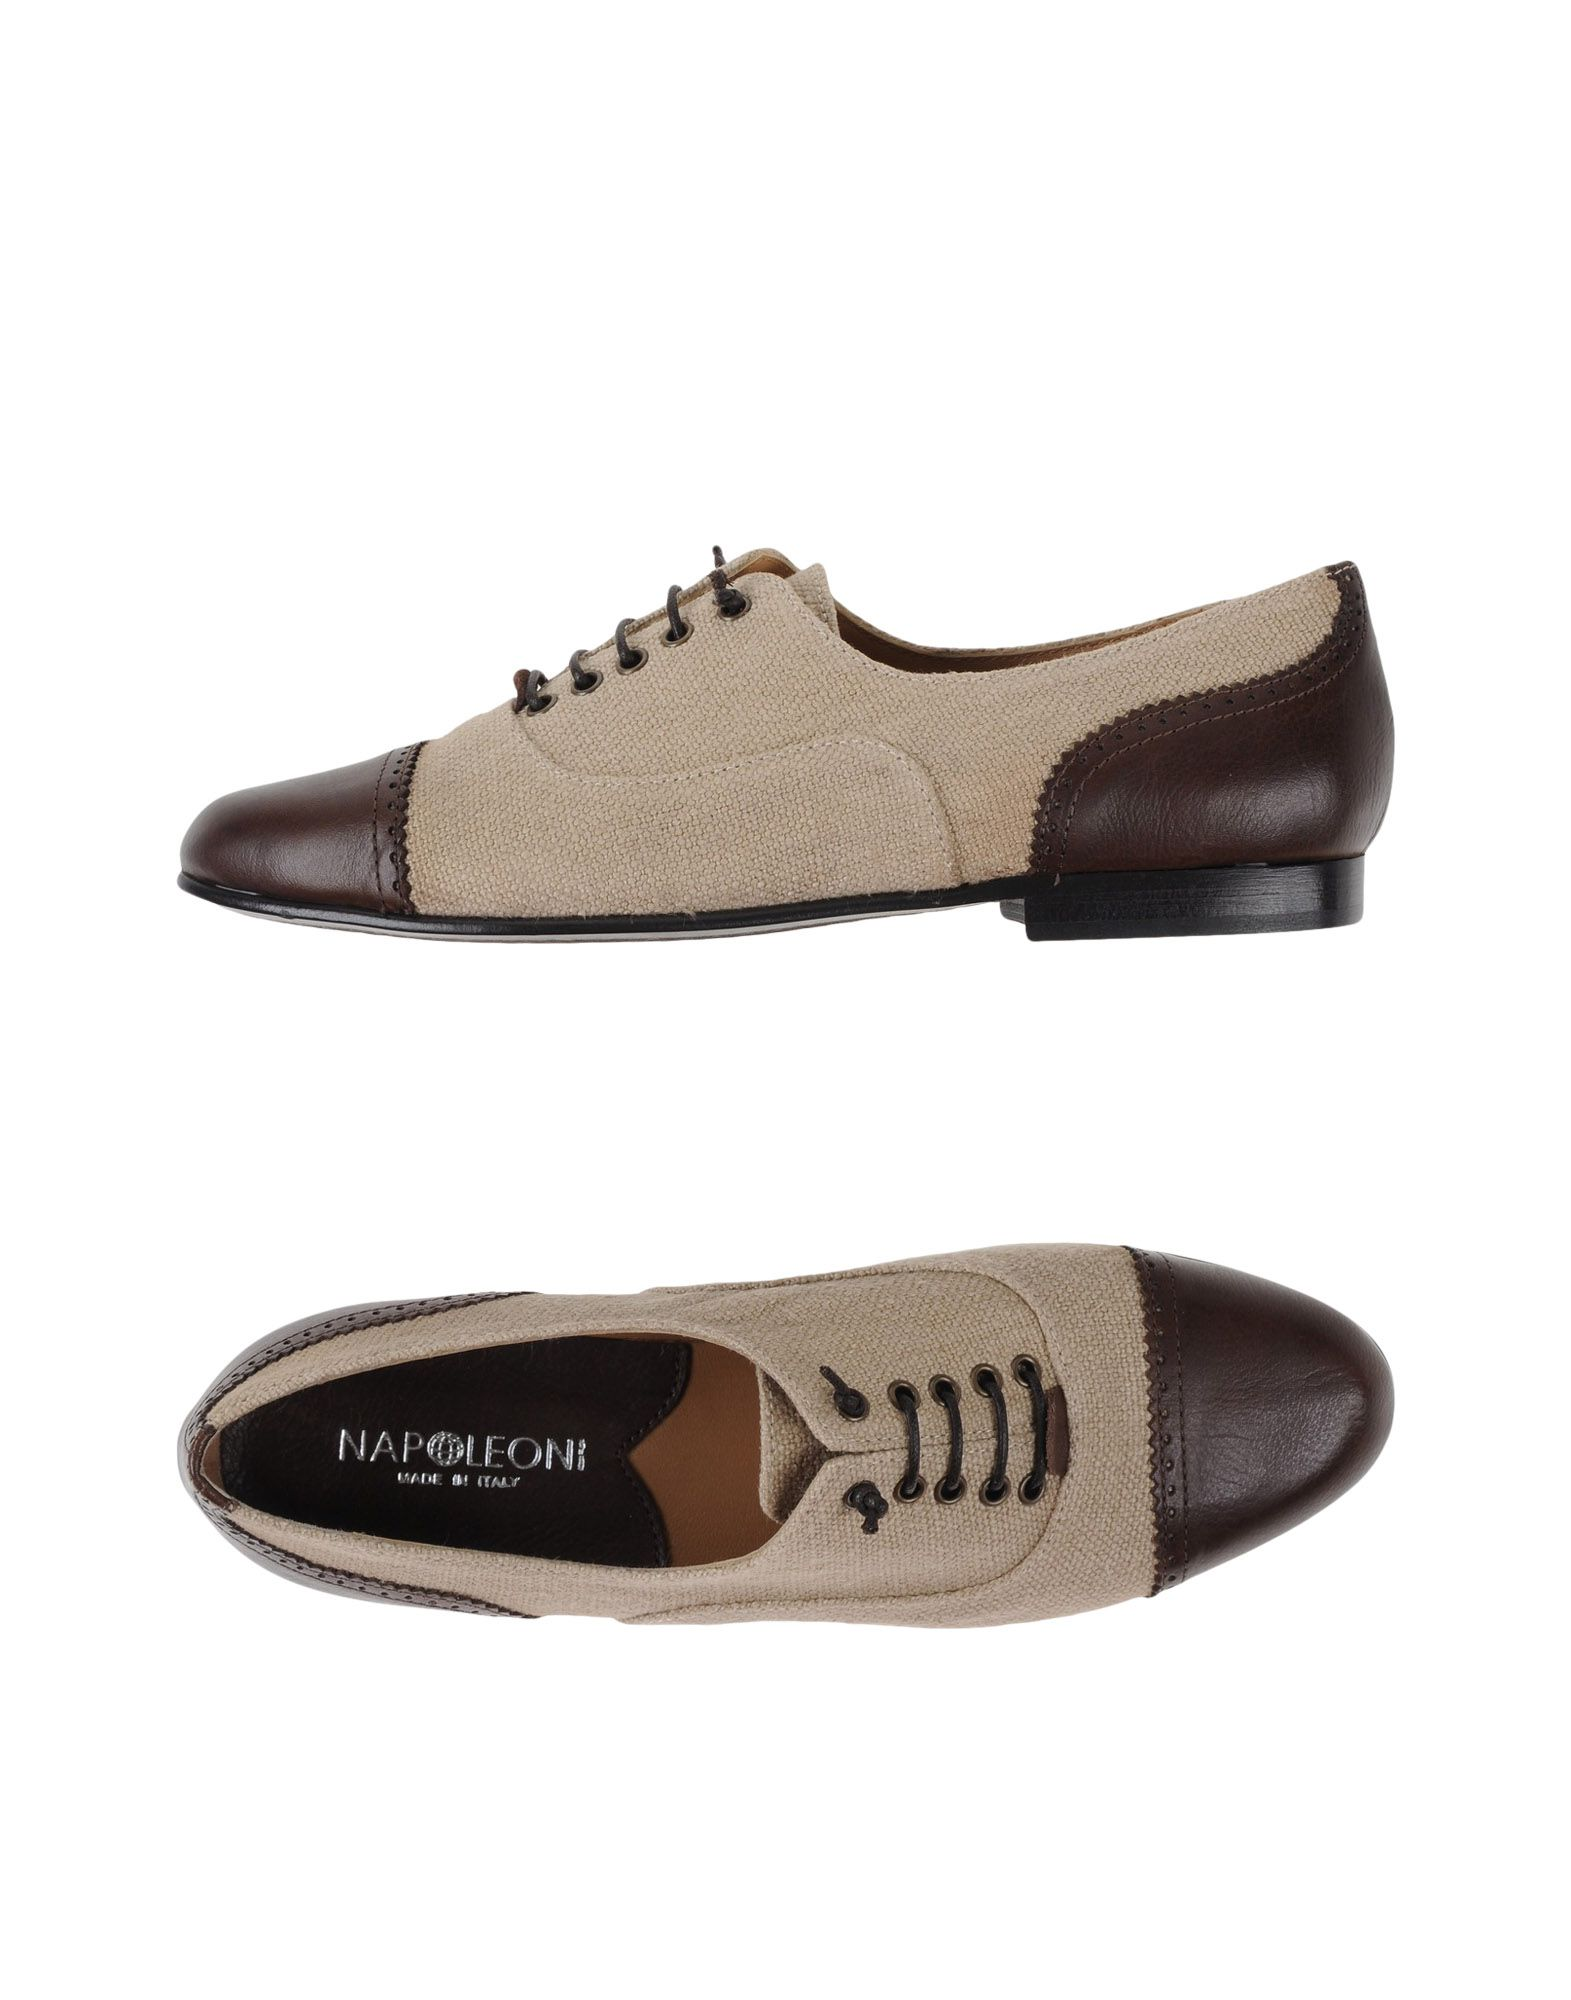 CHAUSSURES - Chaussures à lacetsNapoleoni 3hMr5u7rQ